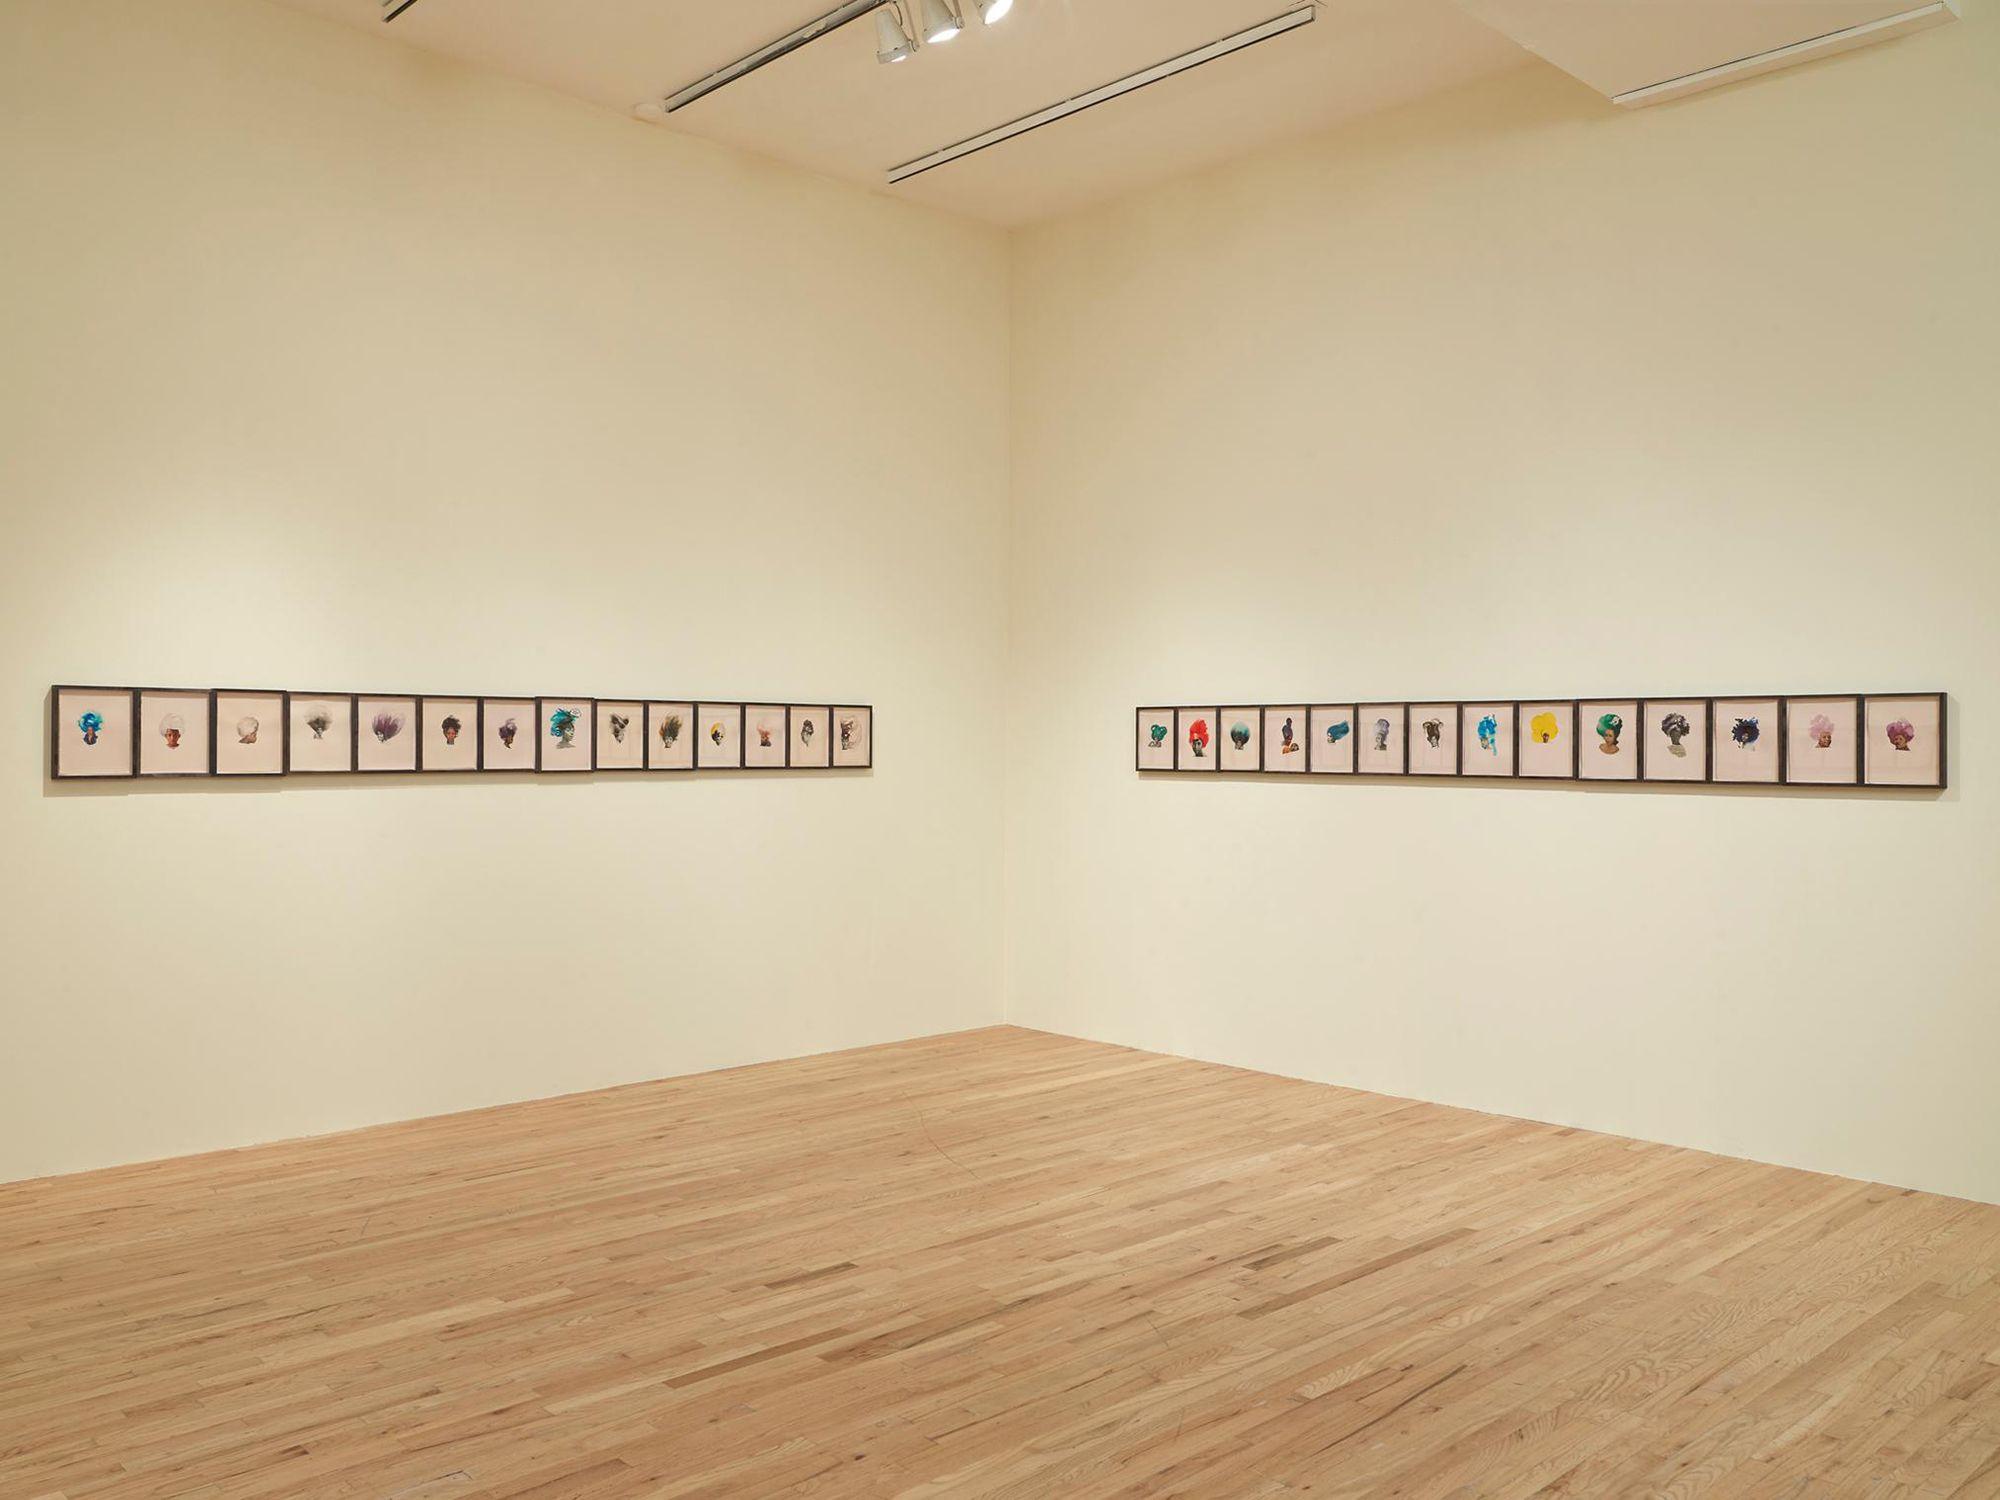 """Lorna Simpson: Works on Paper"", Aspen Art Museum, Aspen, CO 2013"